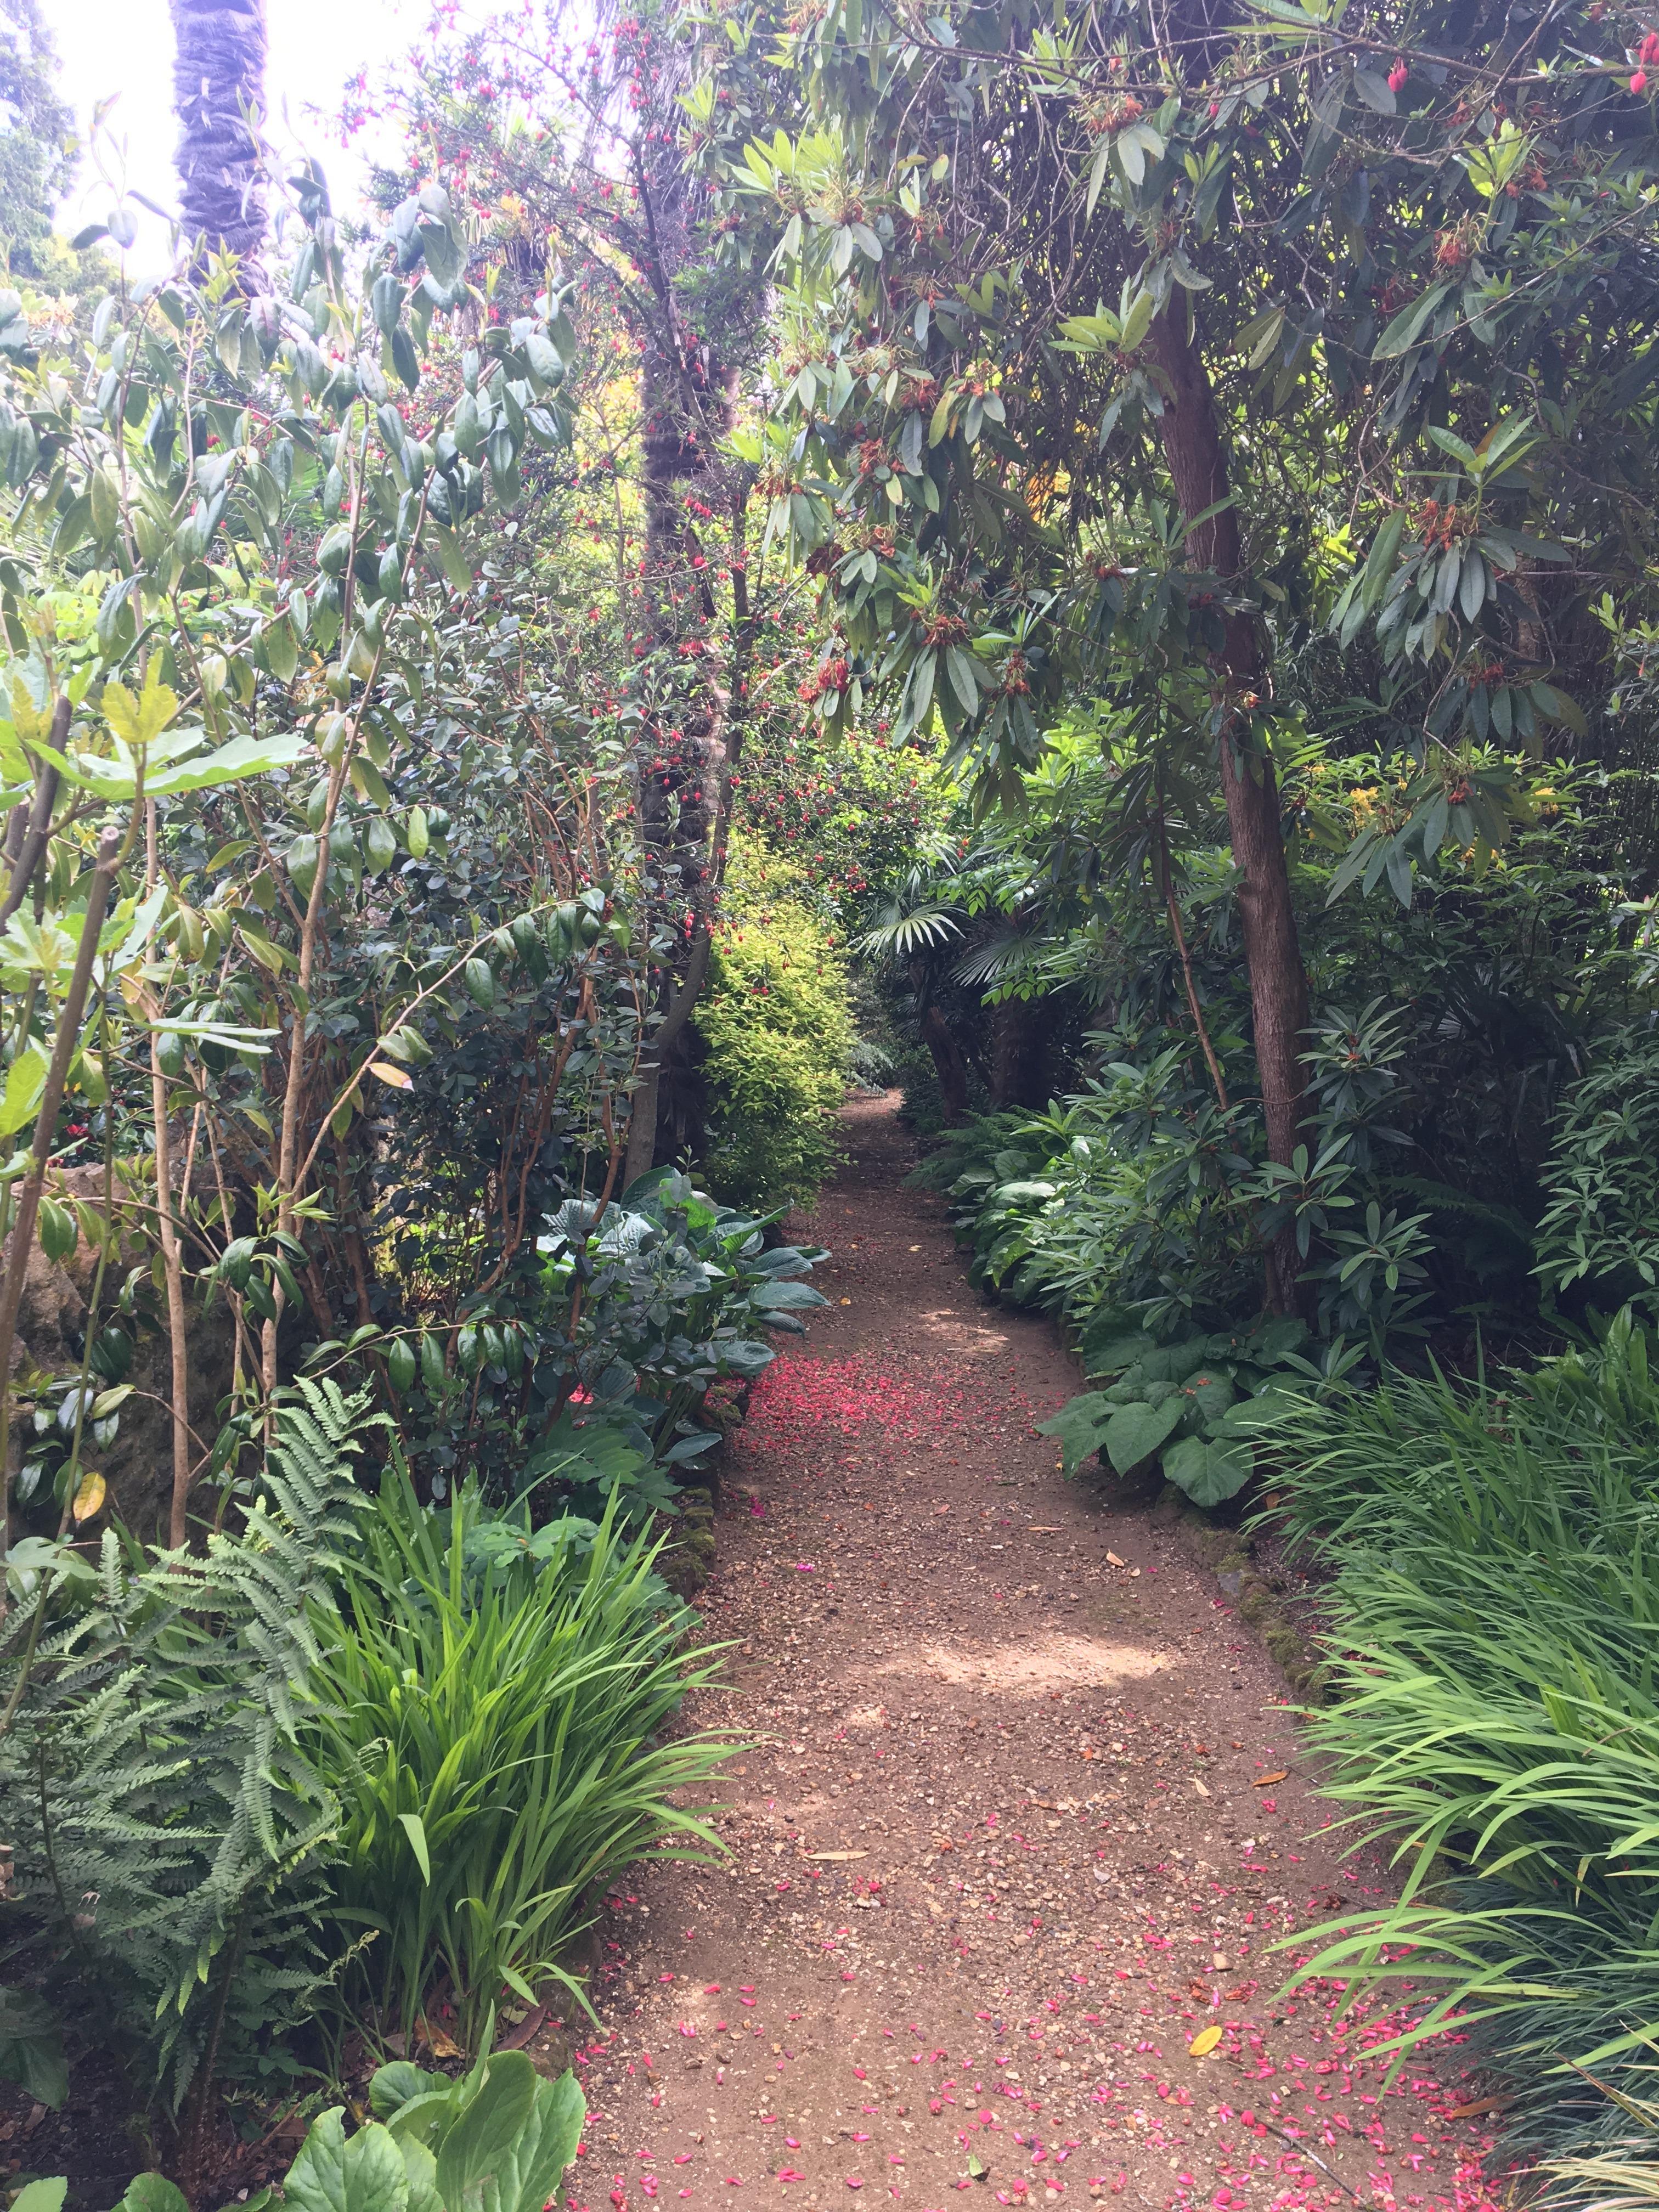 Trees, ferns, palm trees HArdy Tropical Plants UK